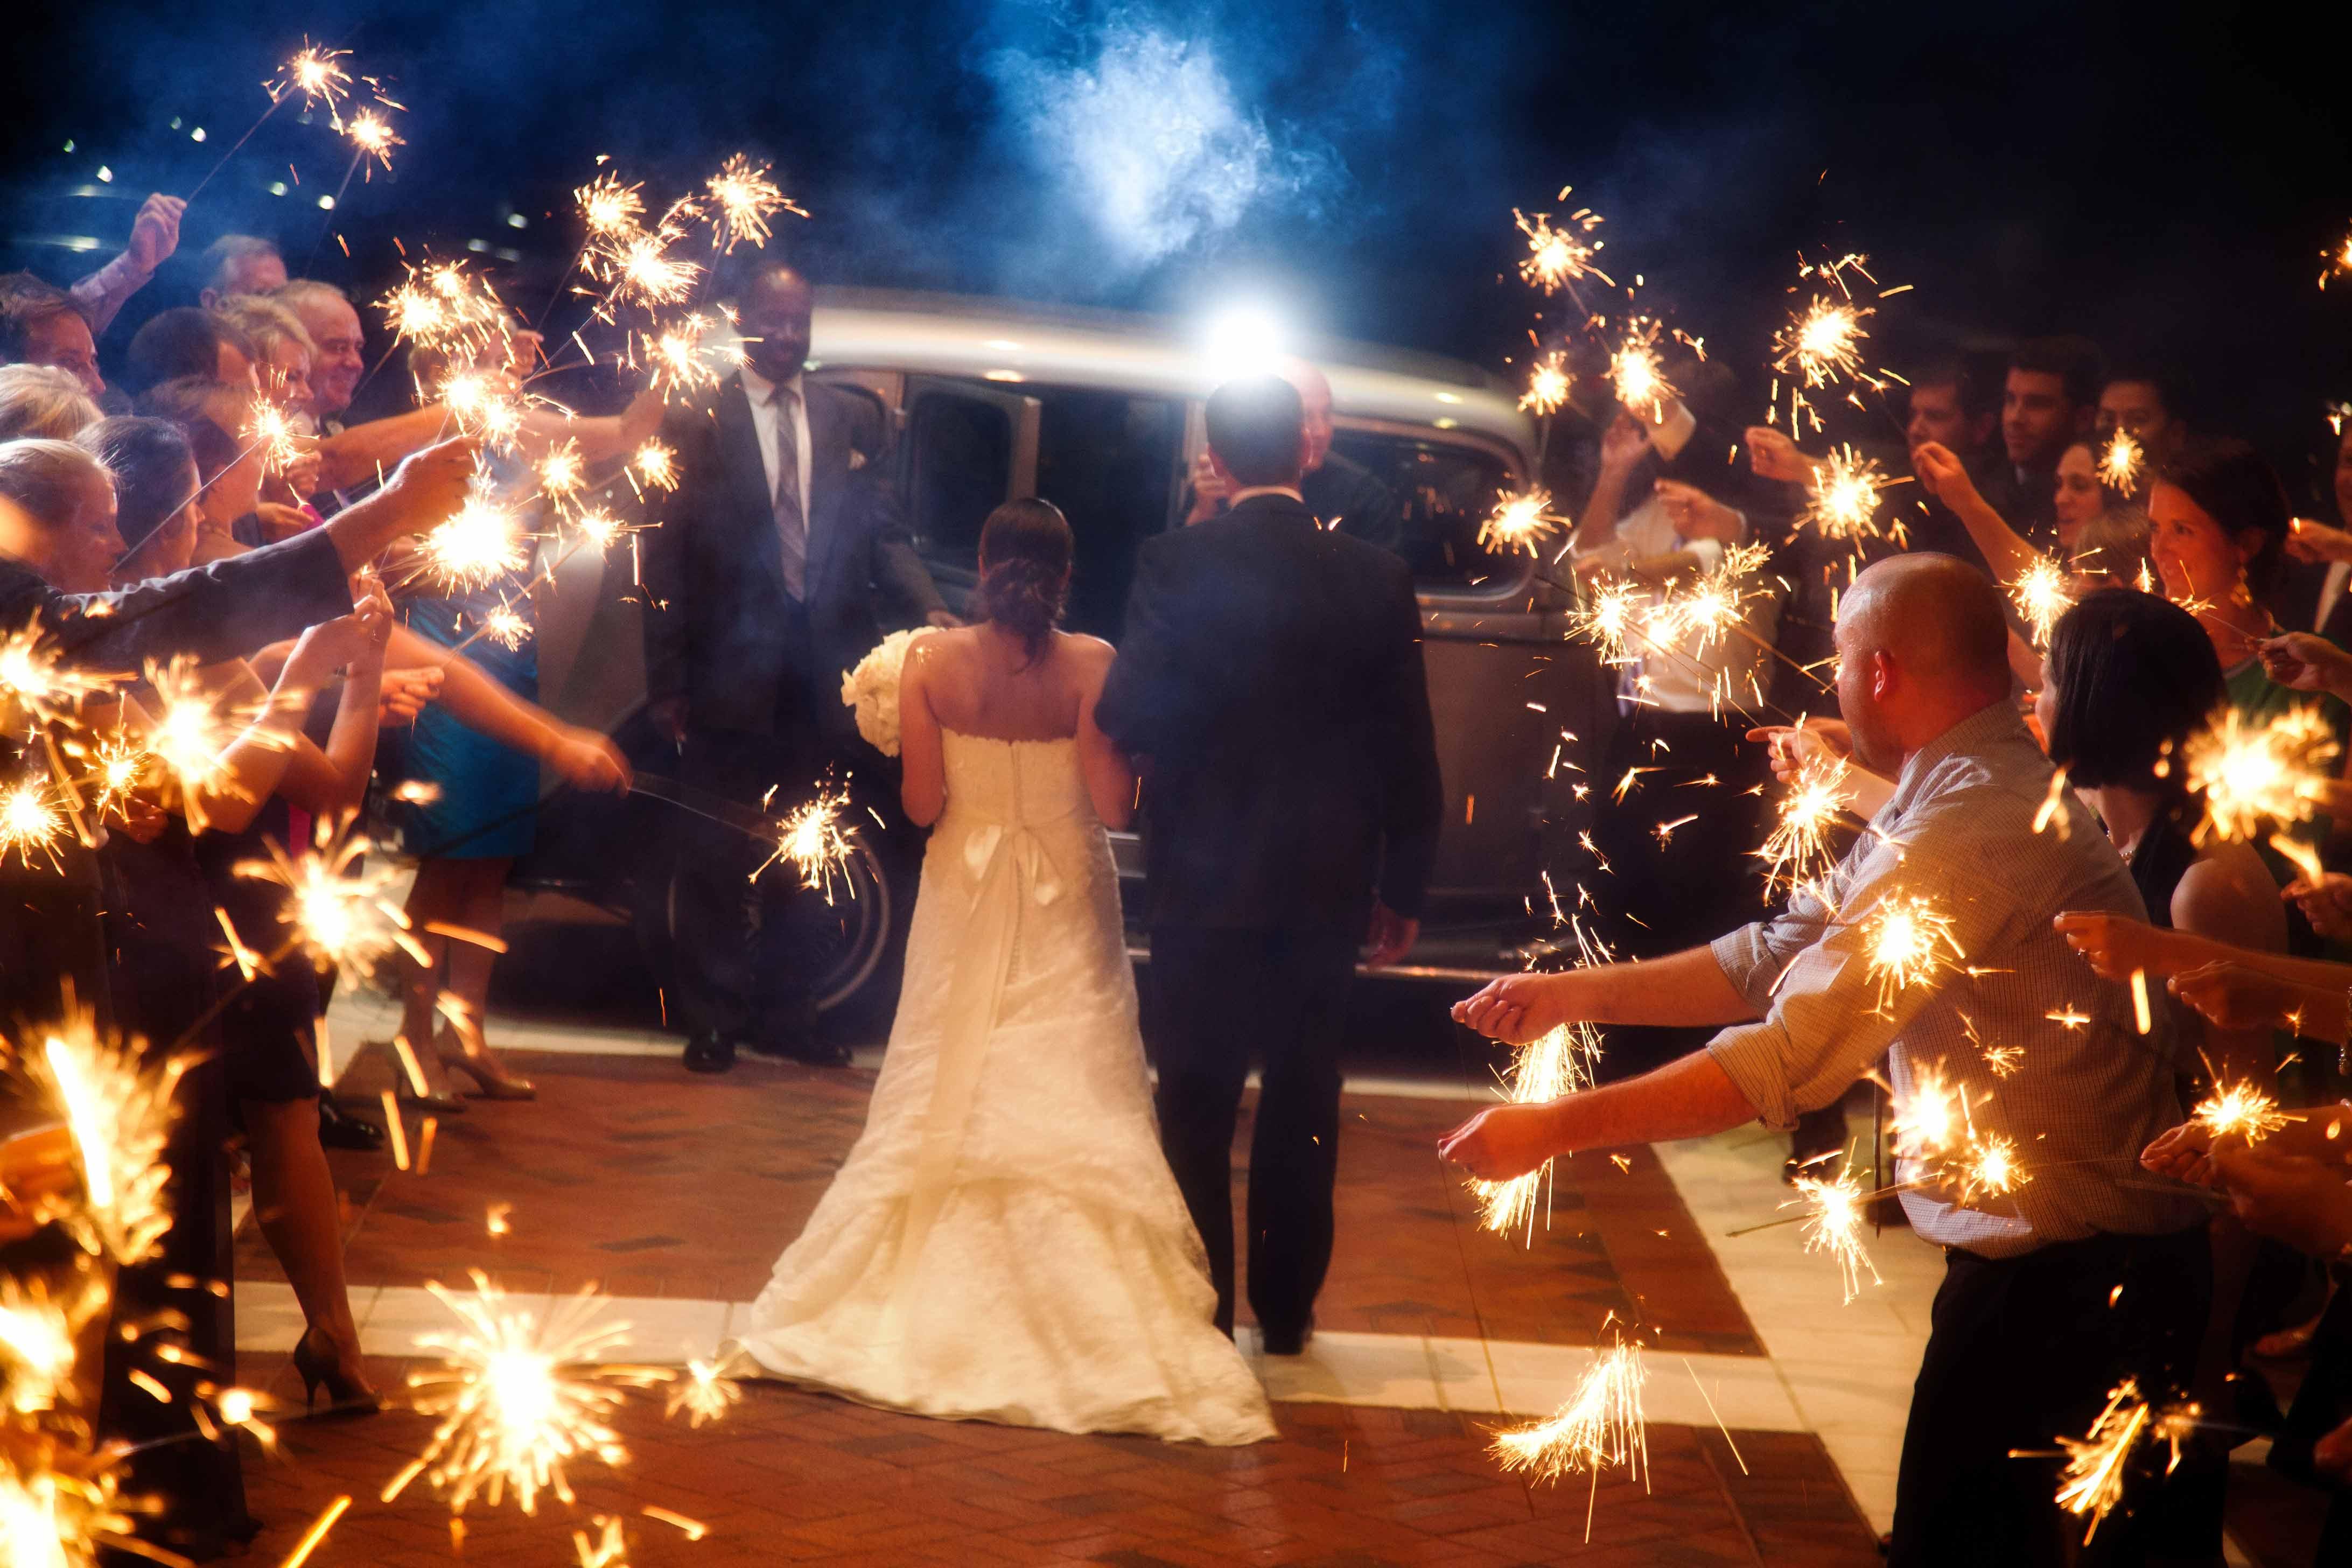 Bride and groom walking towards getaway car sparkler exit at night reception